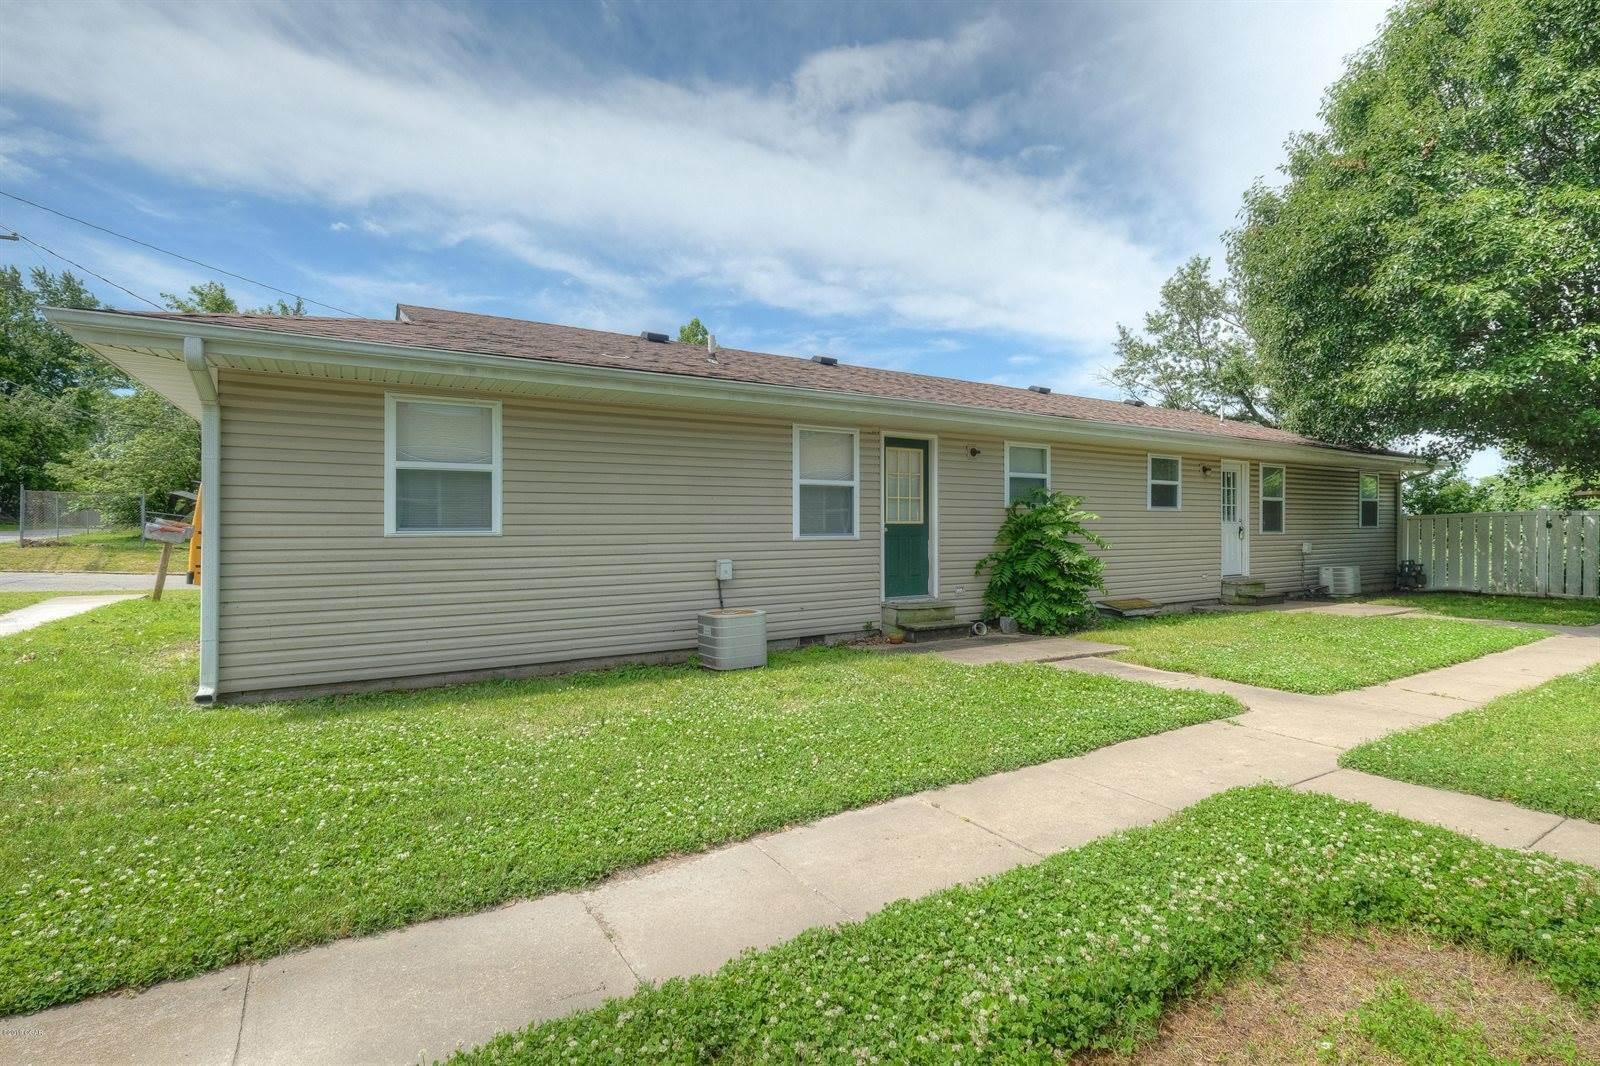 125-127 South St Louis Avenue, Joplin, MO 64801